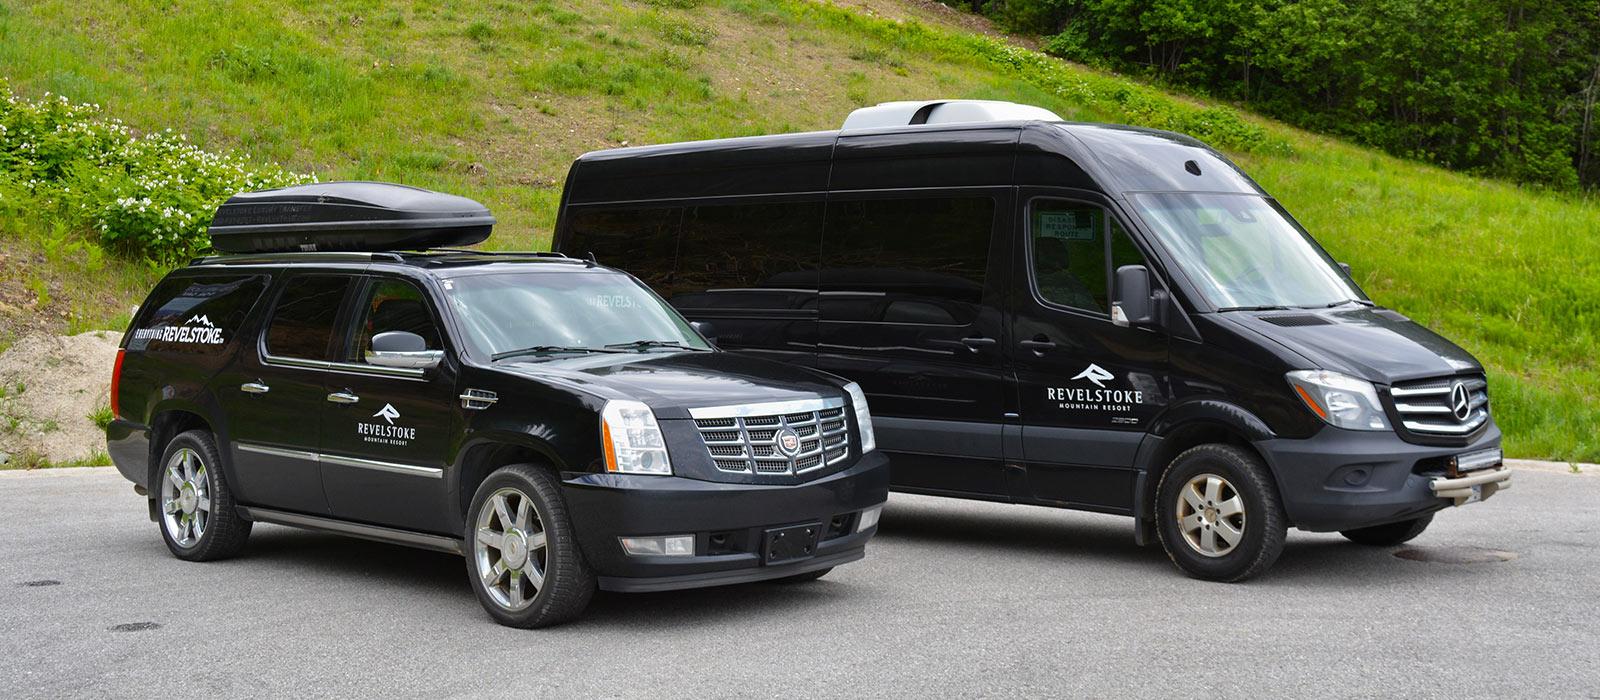 Revelstoke Private Transfer Vehicles